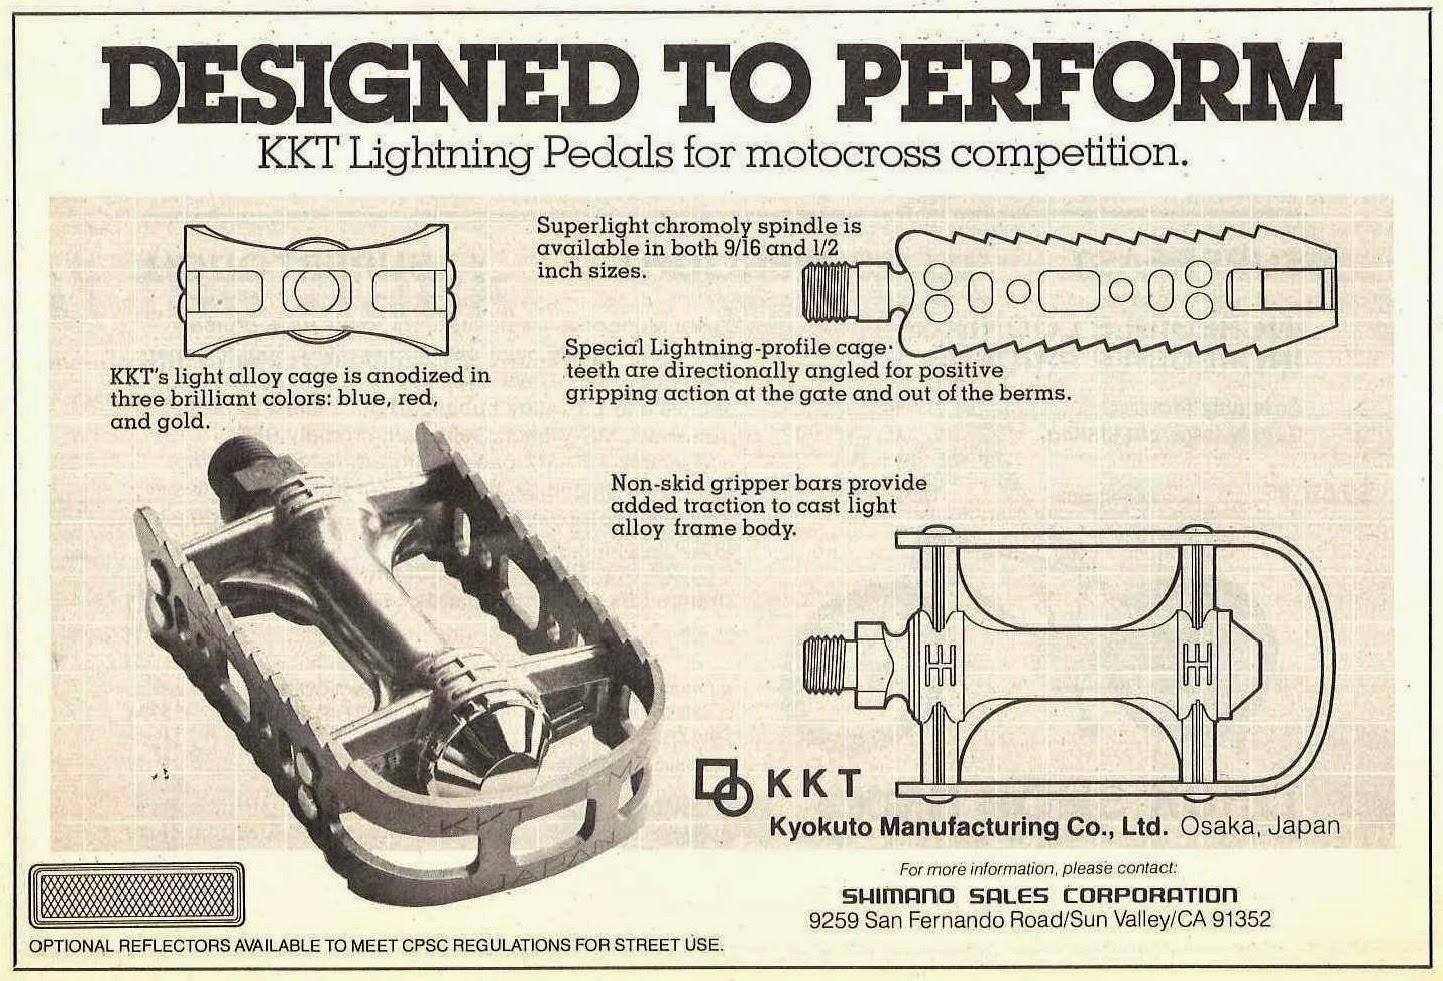 kkt lightning pedals - advertisement may 1980.jpg